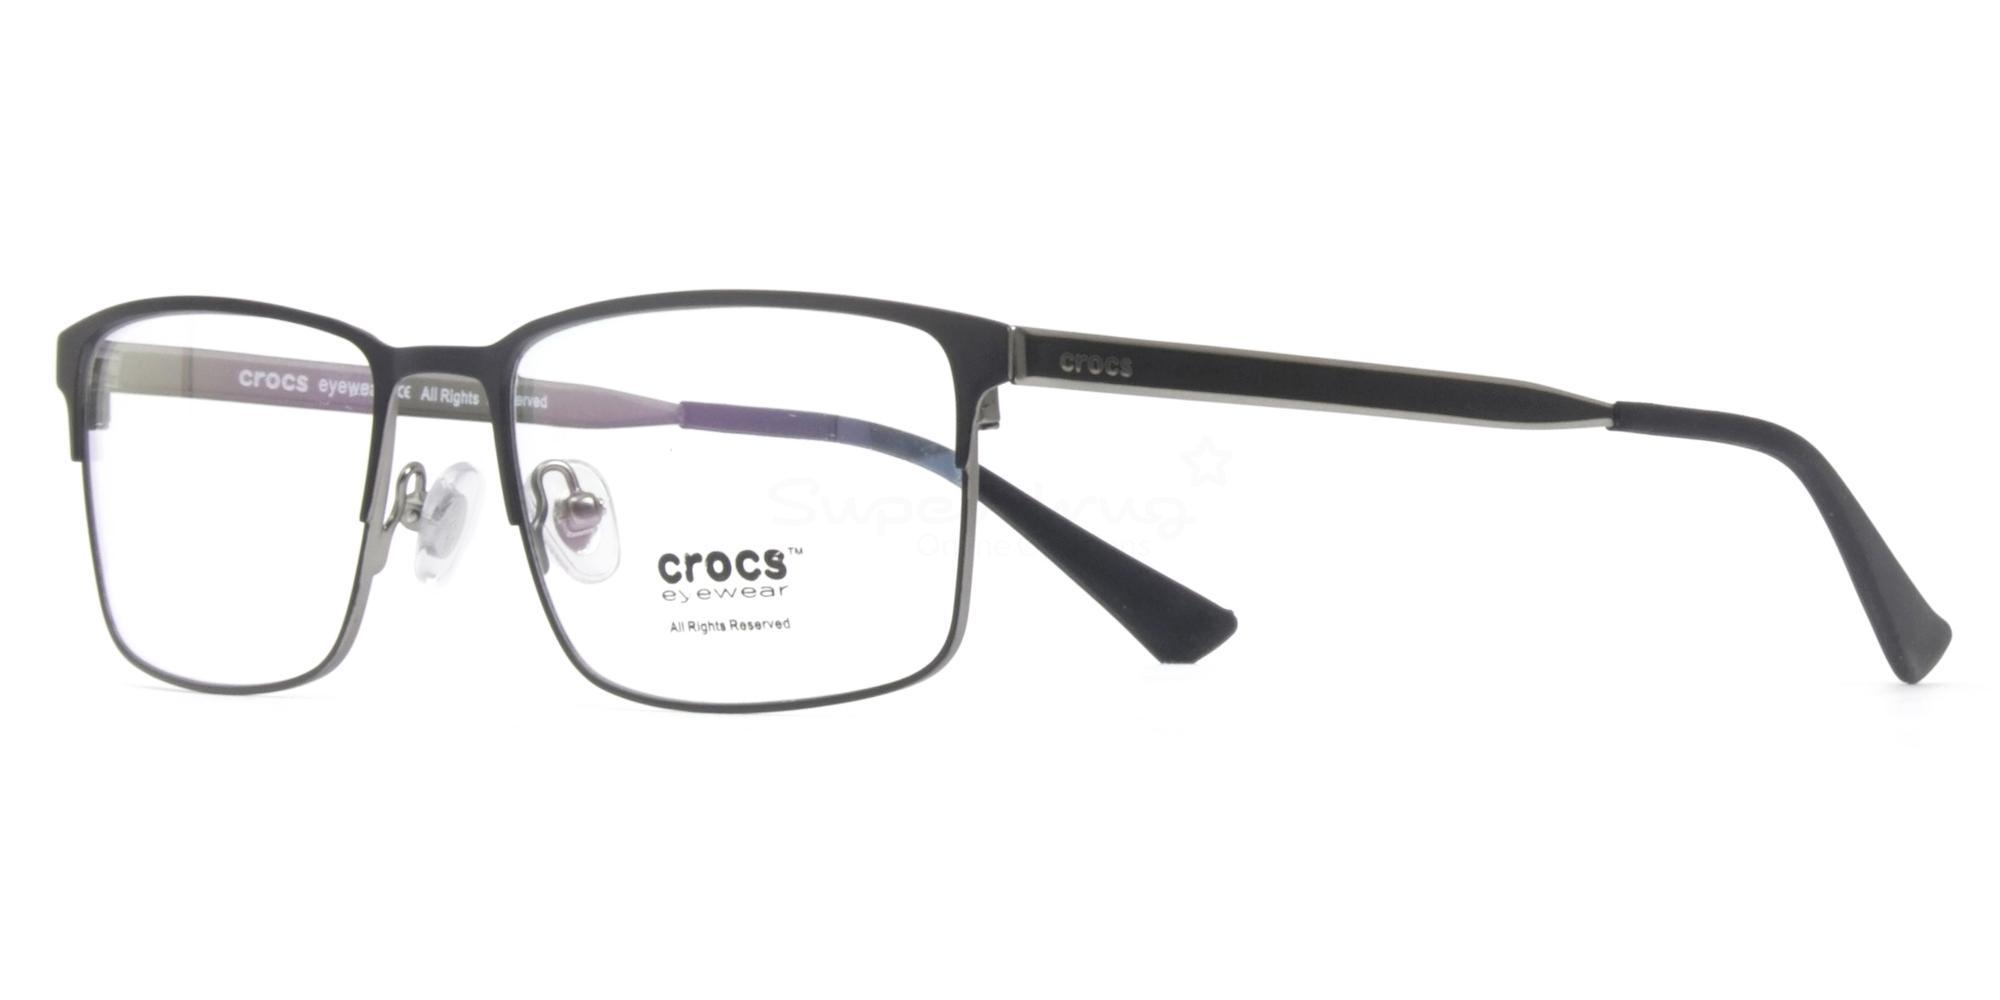 20GY CF4356 Glasses, Crocs Eyewear